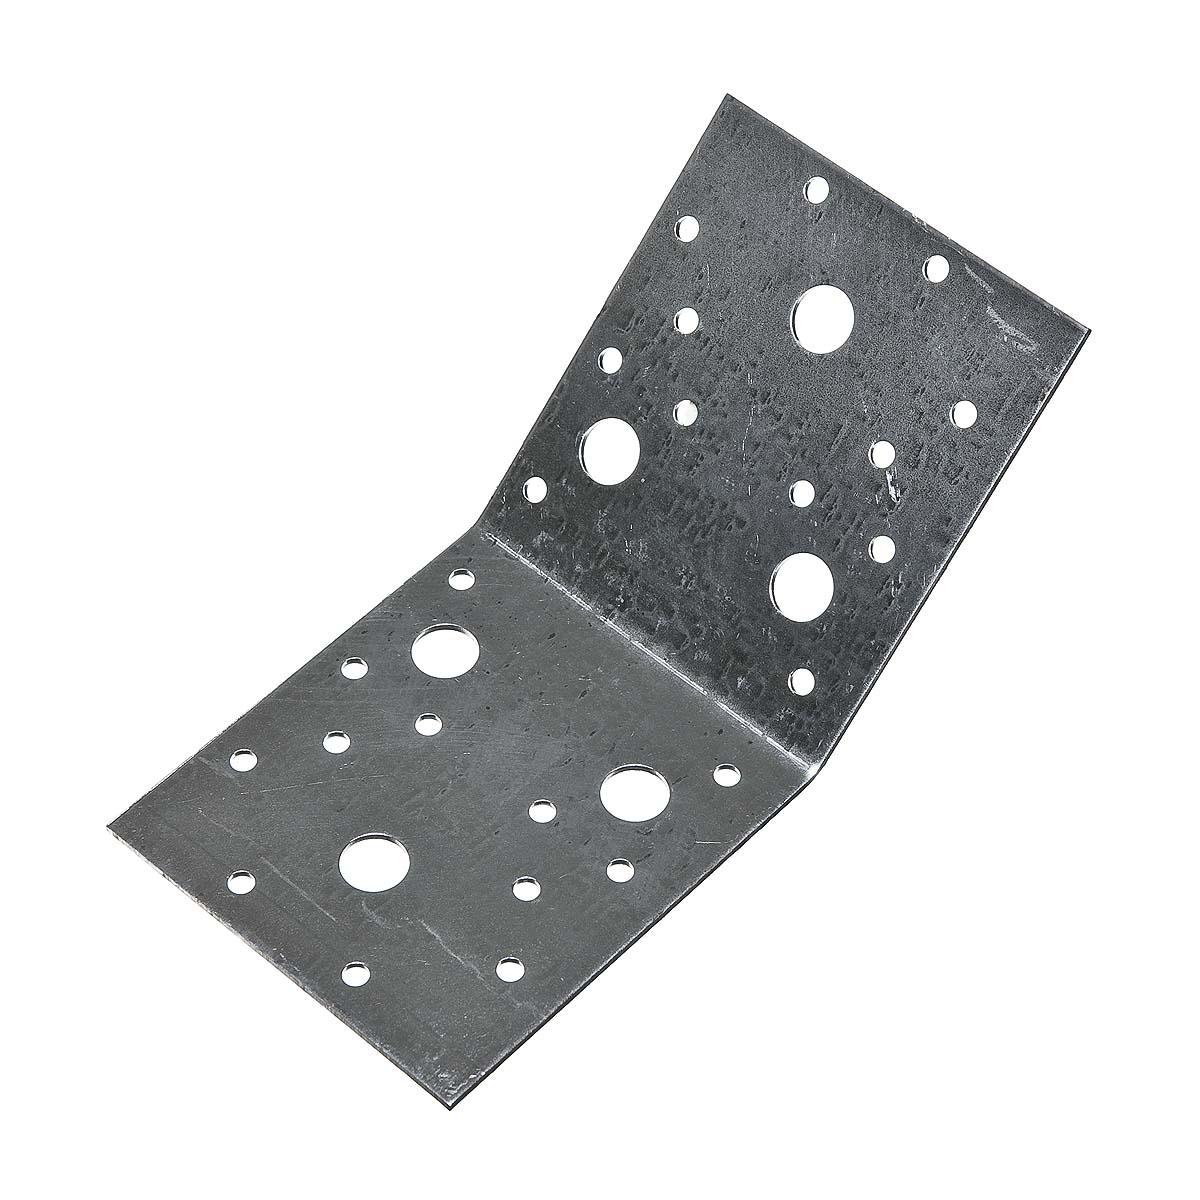 Уголок для стропильных соединений оцинкованный 105х105х90х2 мм 135°